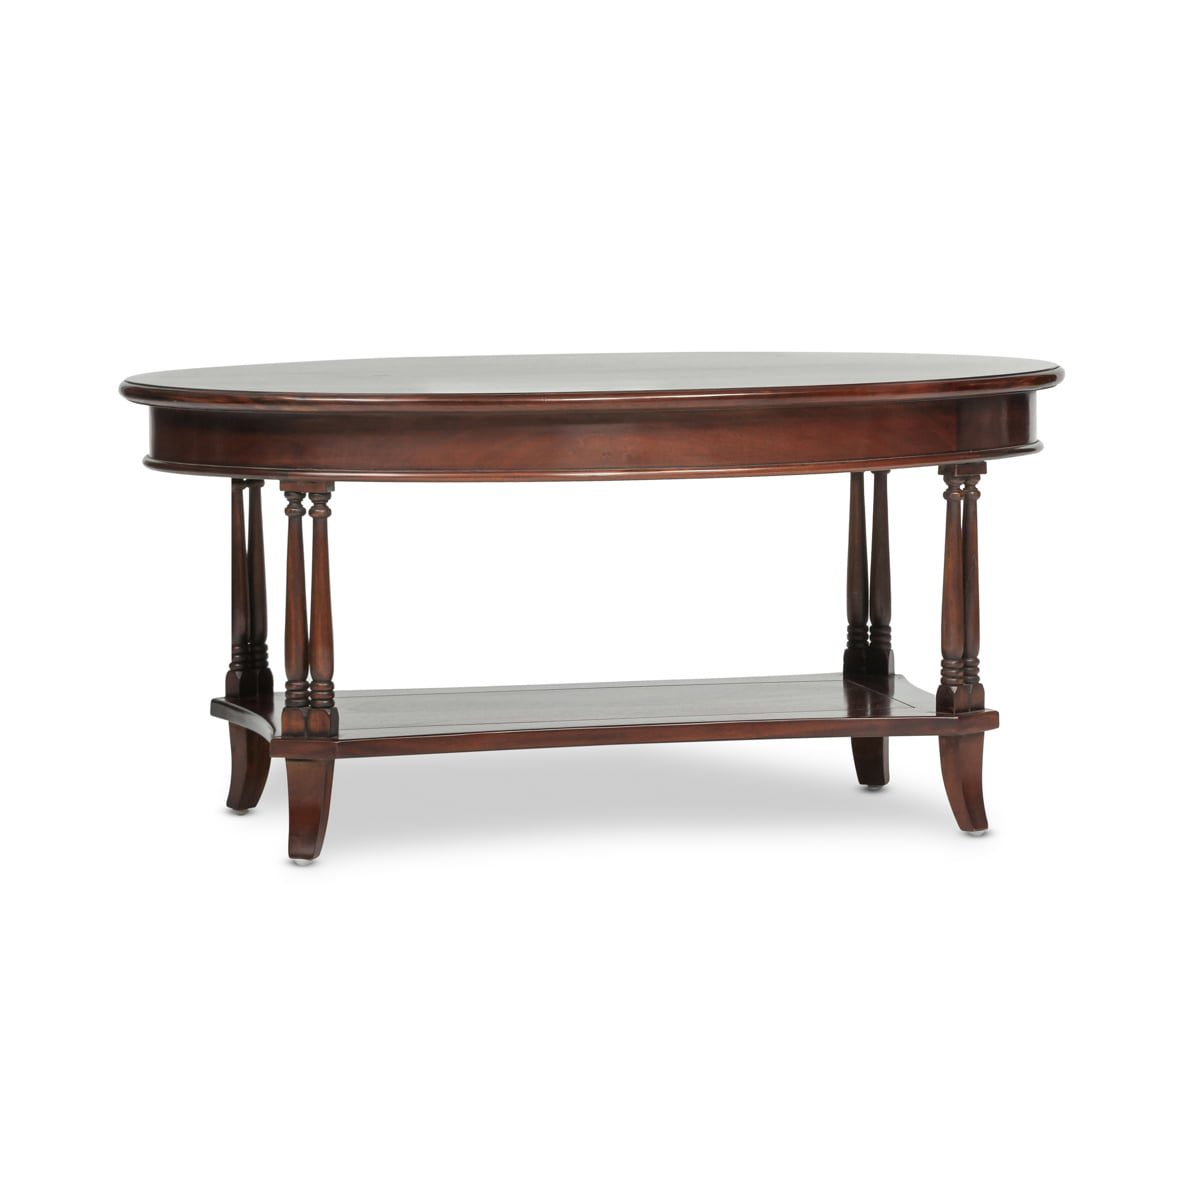 Oval Coffee Table with Shelf